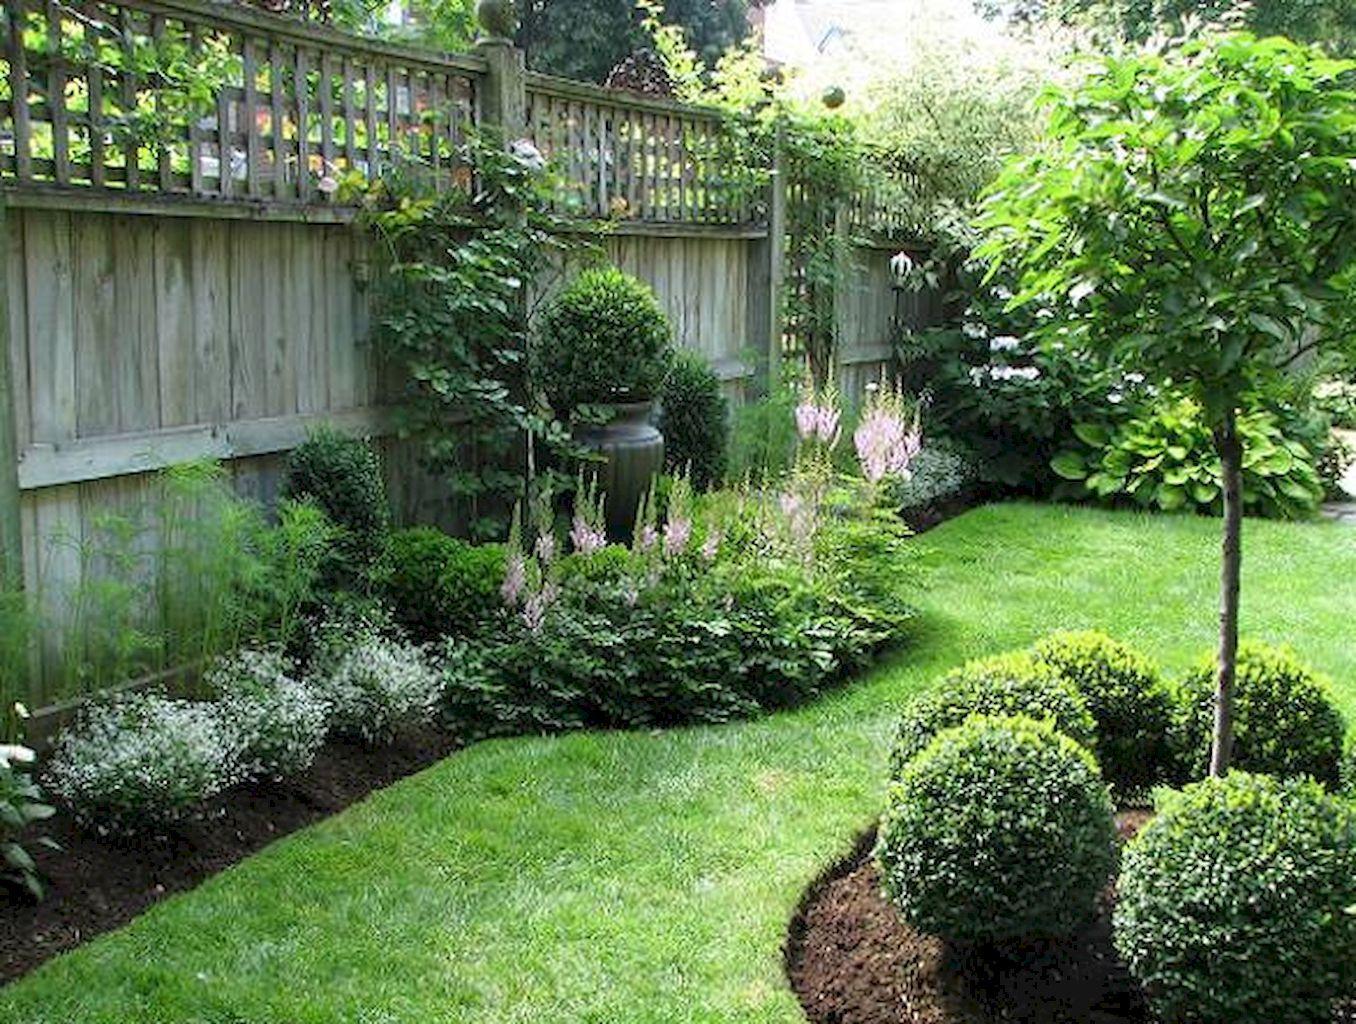 Backyard Landscaping Ideas On A Budget   Backyard Ideas on Inexpensive Backyard Landscaping id=81388